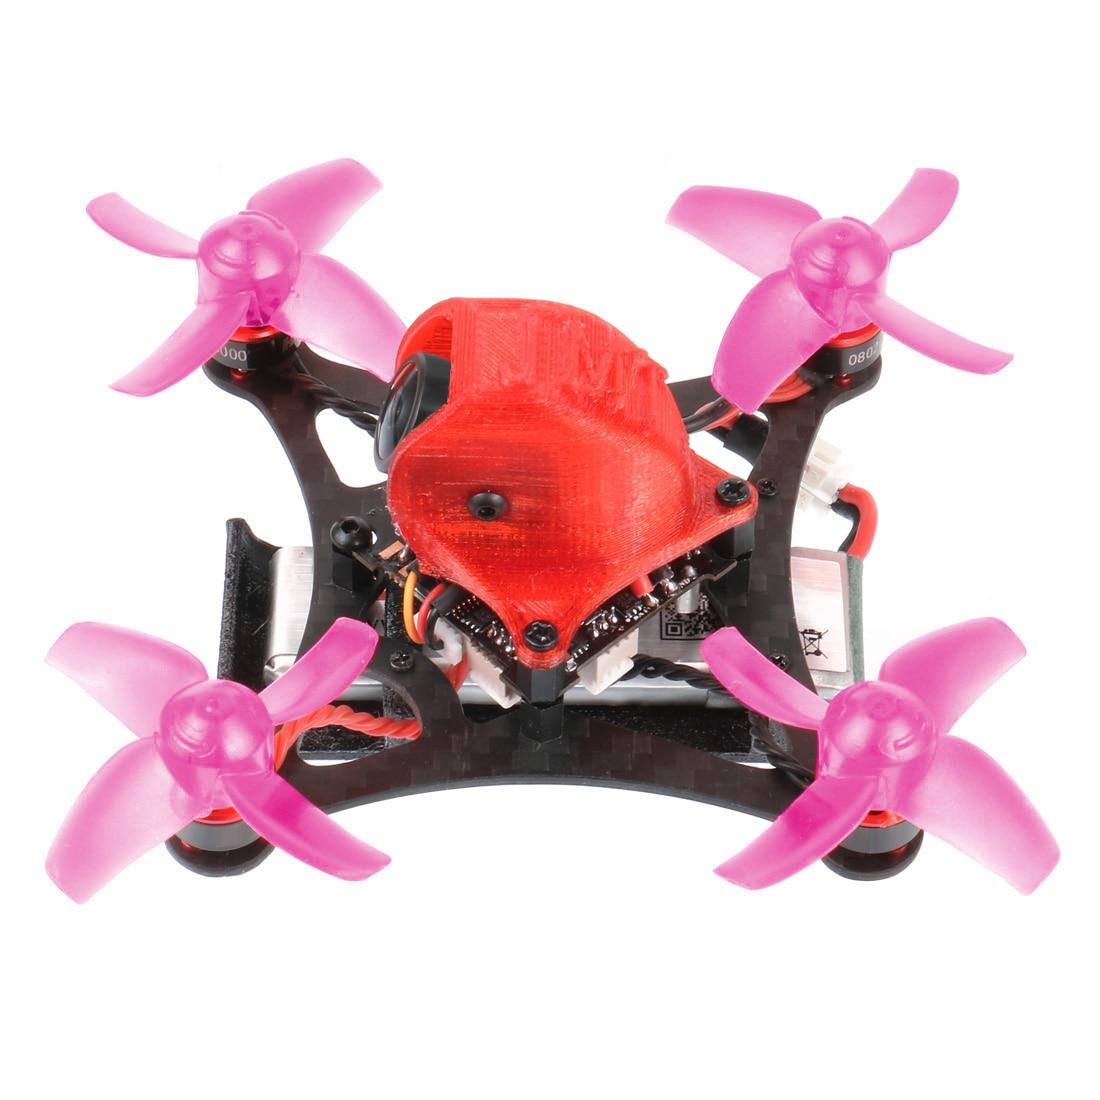 JMT 85MM DIY Drone RC BNF Kit con Crazybee F4 Lite integrado Frsky RX SE0802 16000kv motores 450MAH 1S batería interior Mini FPV Quadcopter